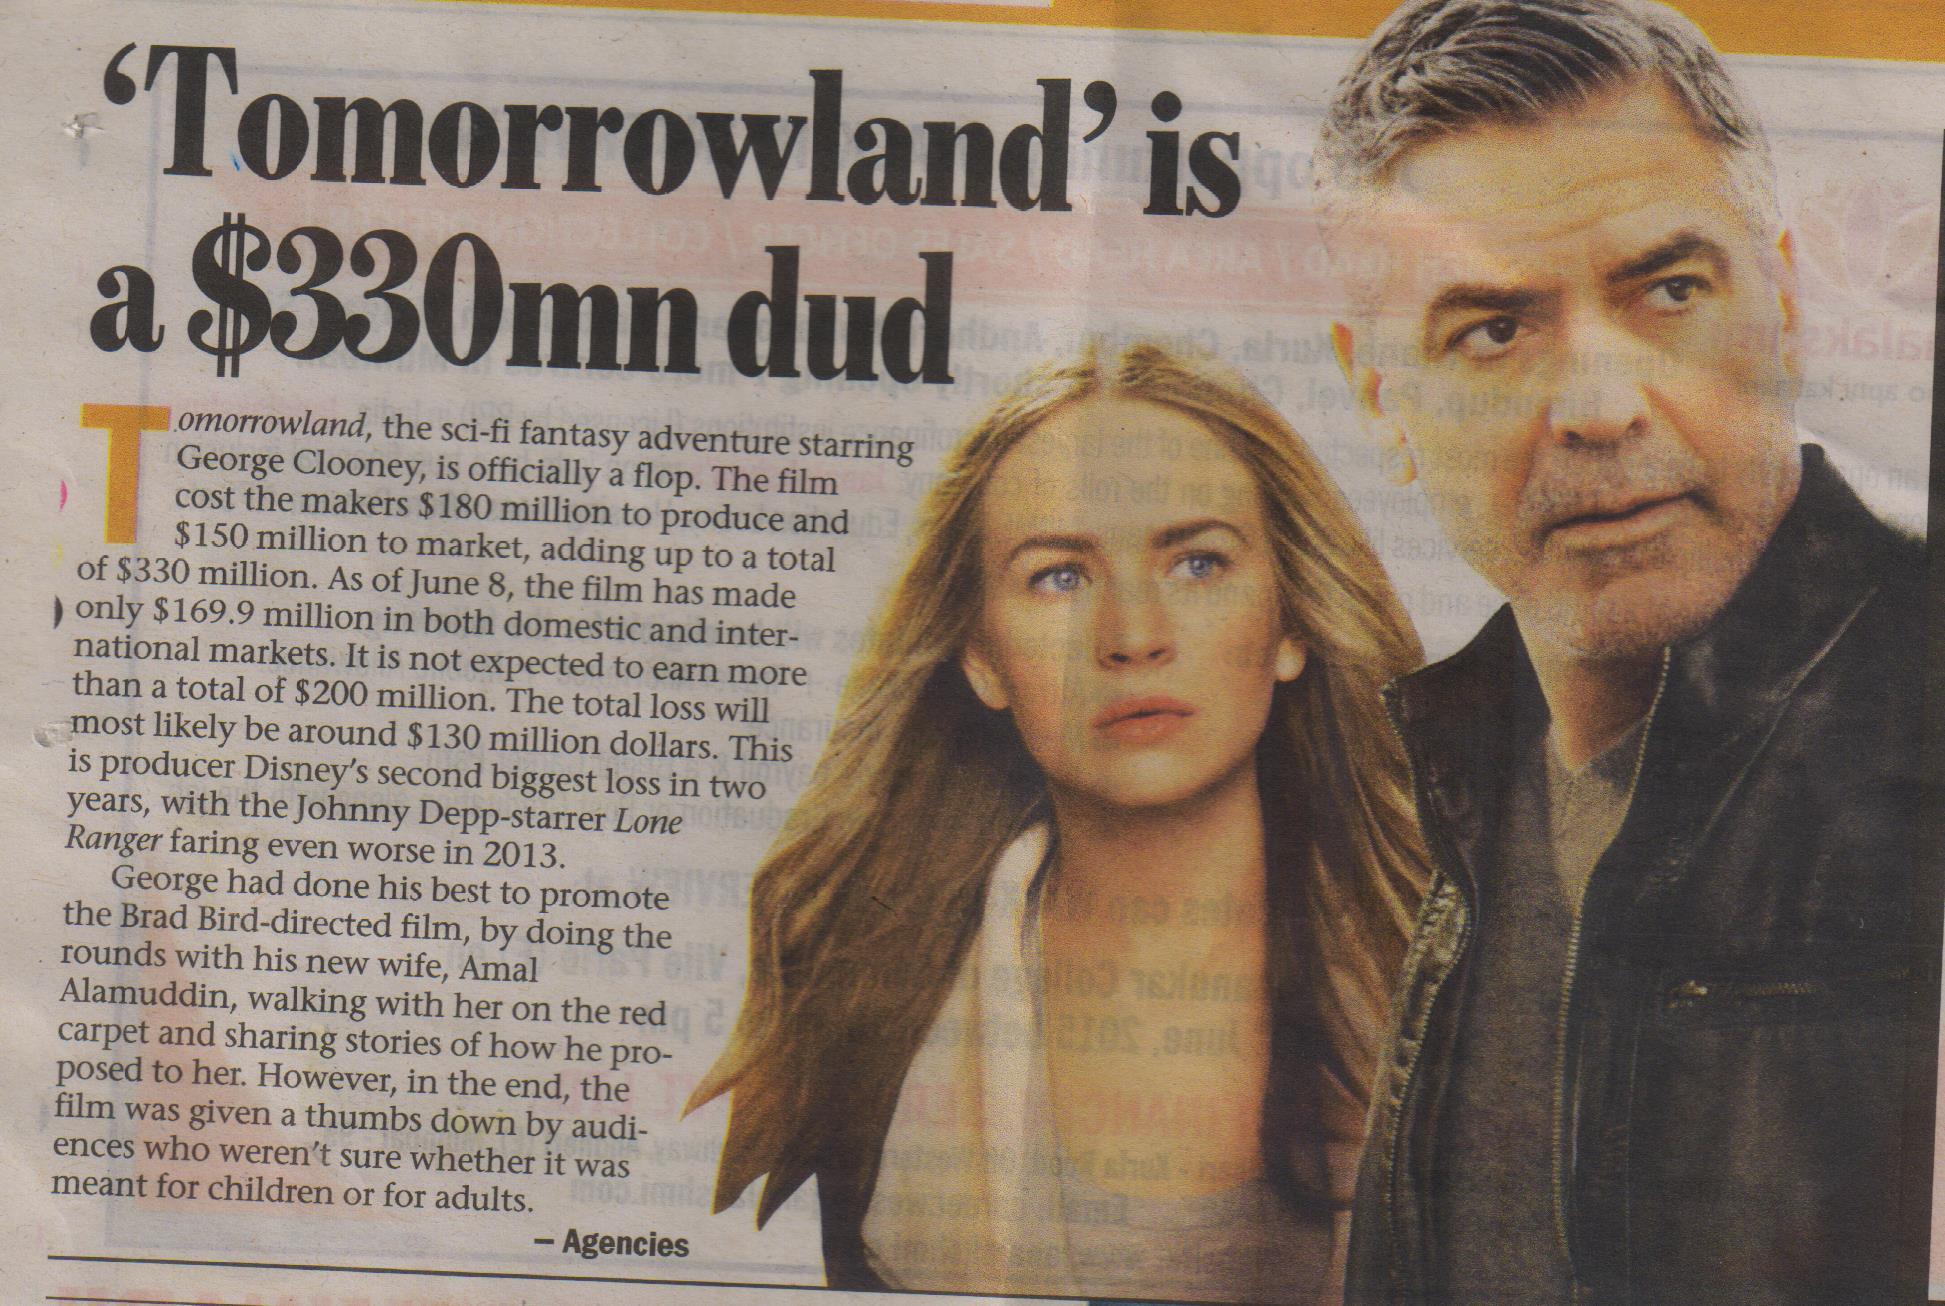 Tomorrowland is 330 mil dud